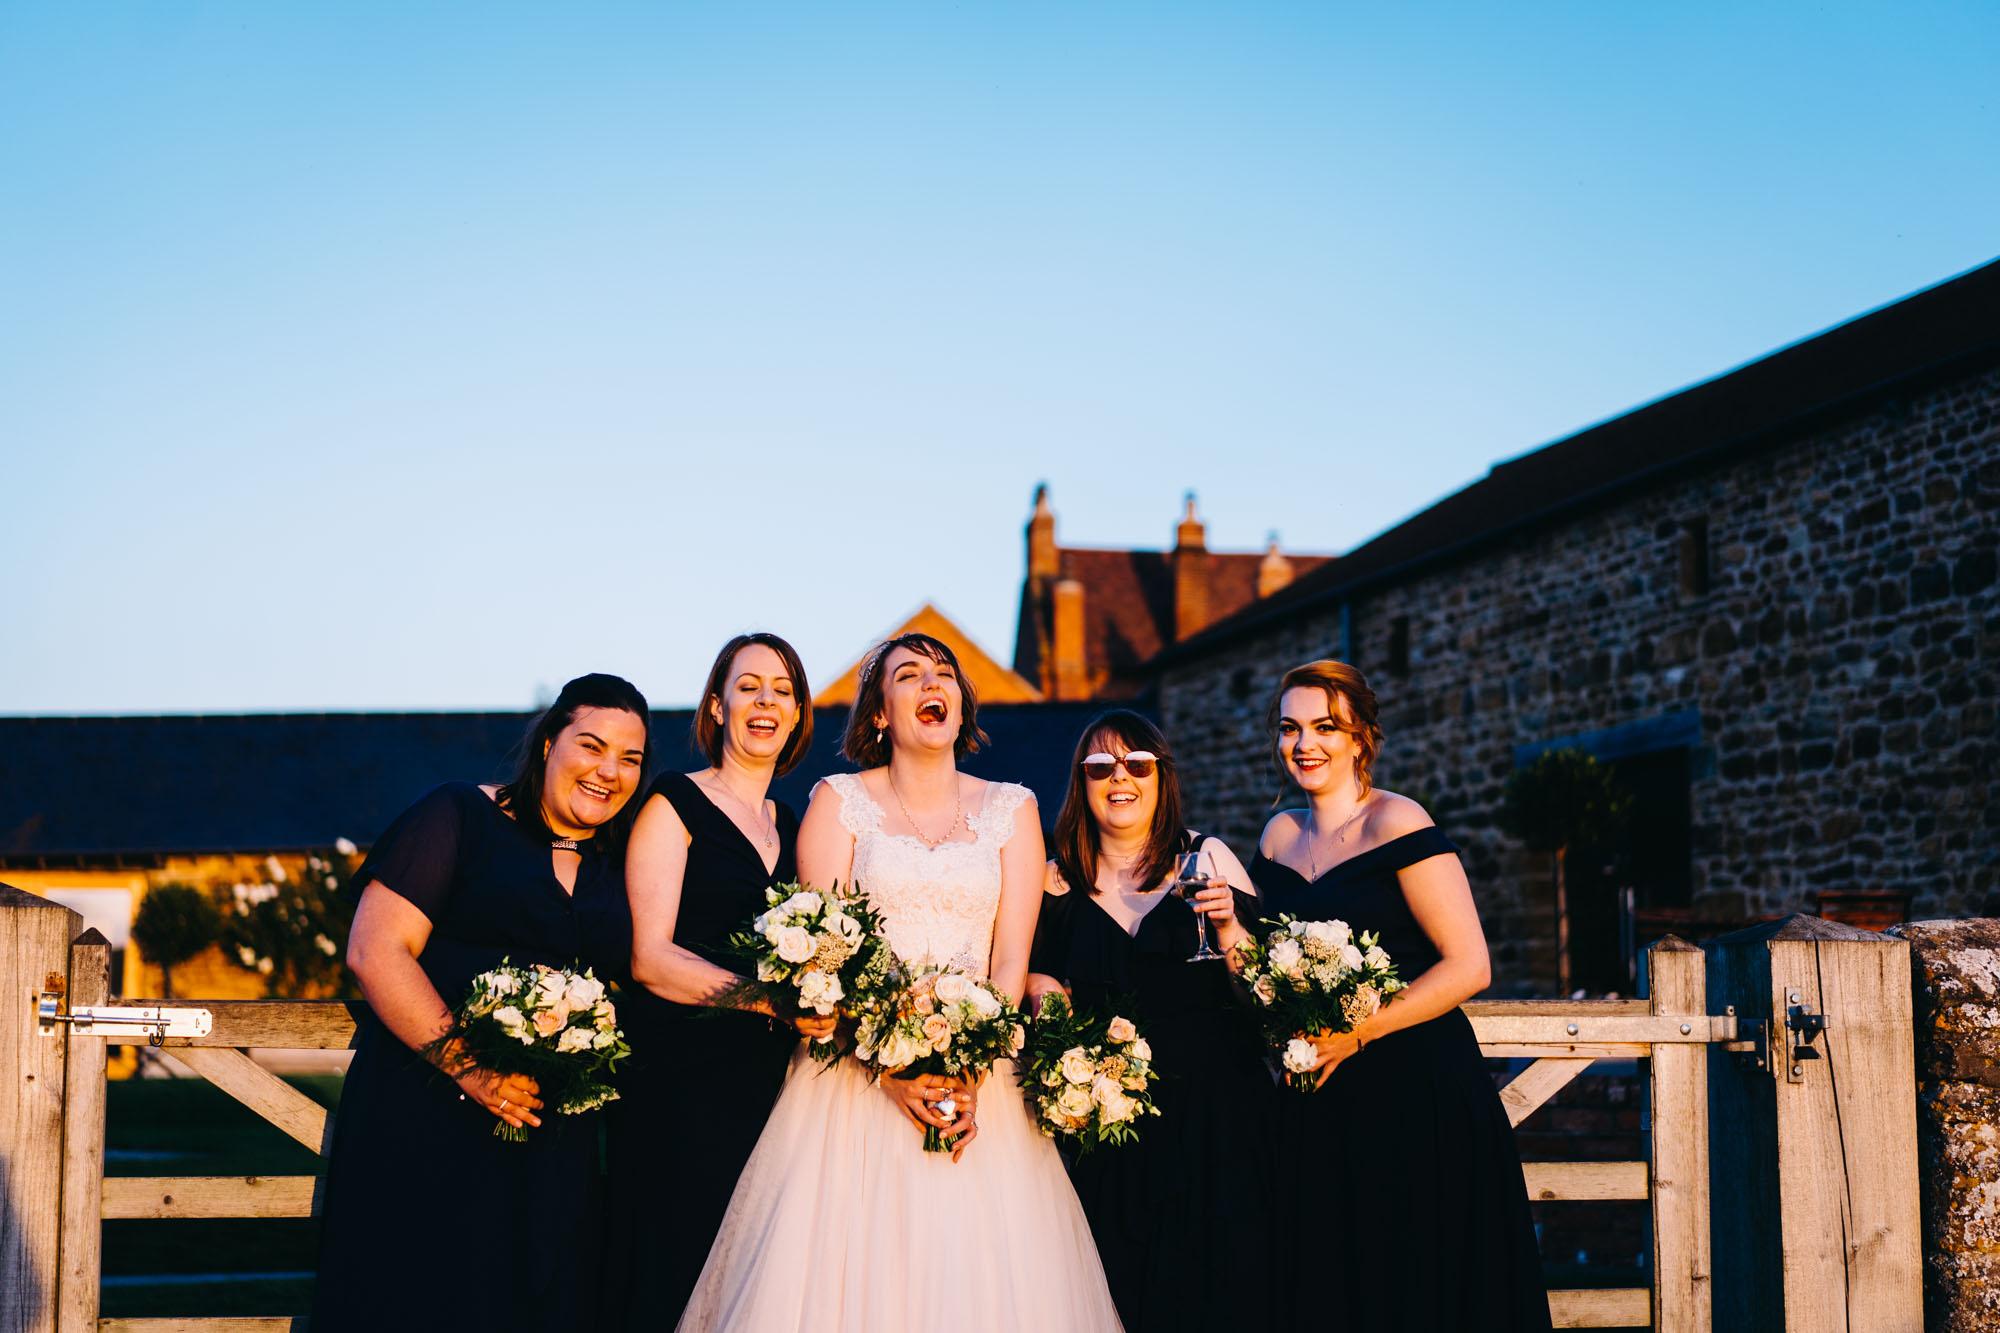 wedding-at-dodford-manor-72